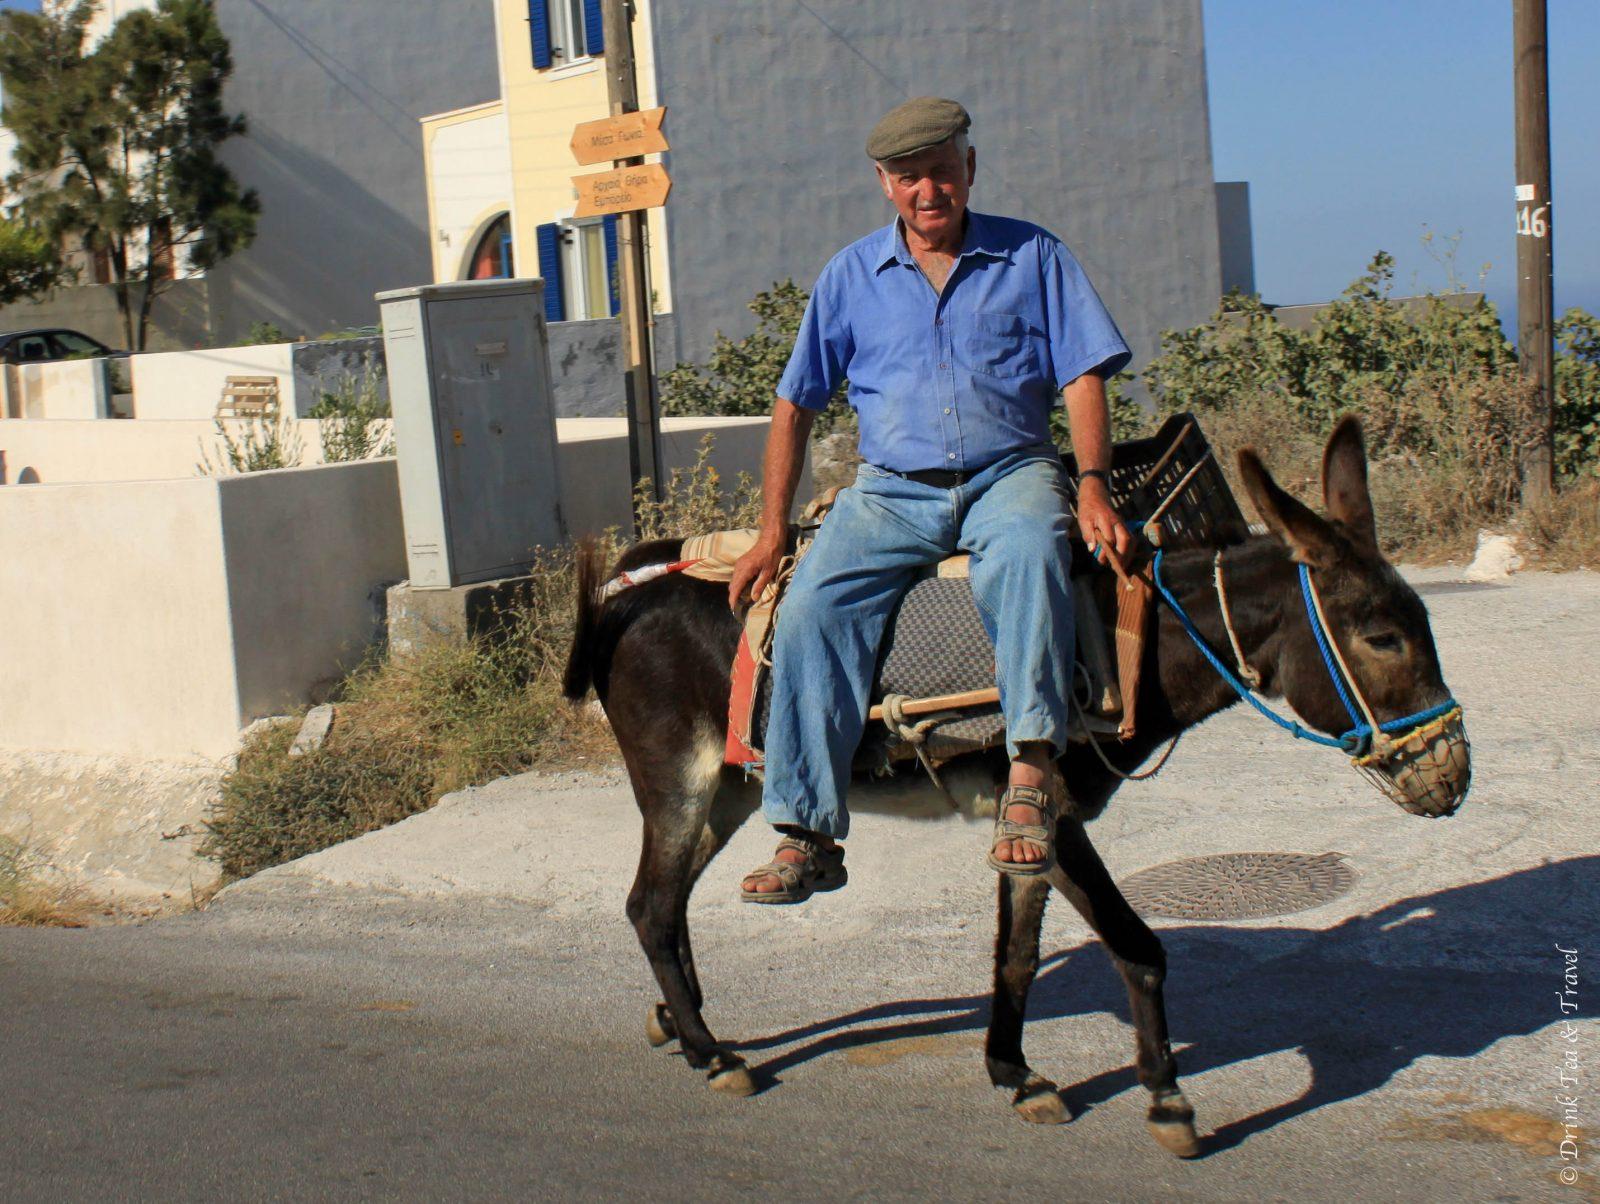 Riding a donkey in Santorini in Greece